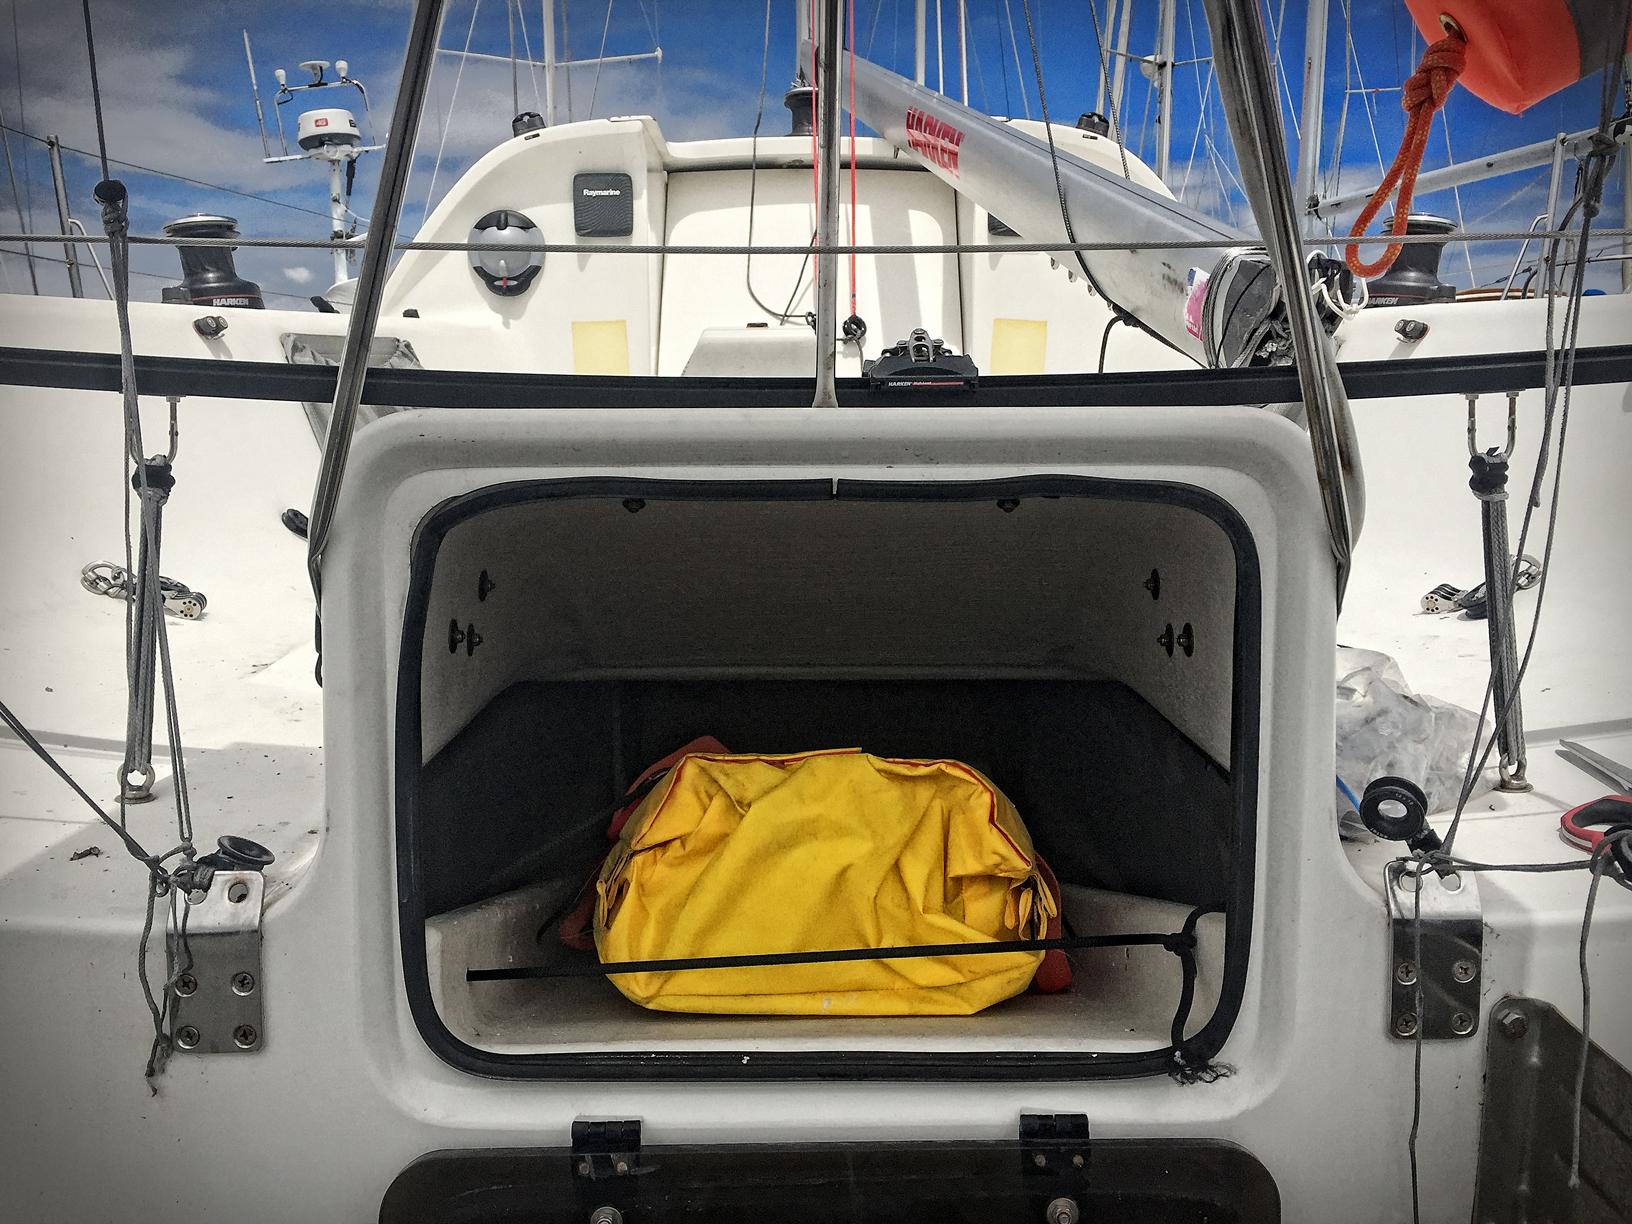 Winslow 4-man ultralight life raft in the escape hatch